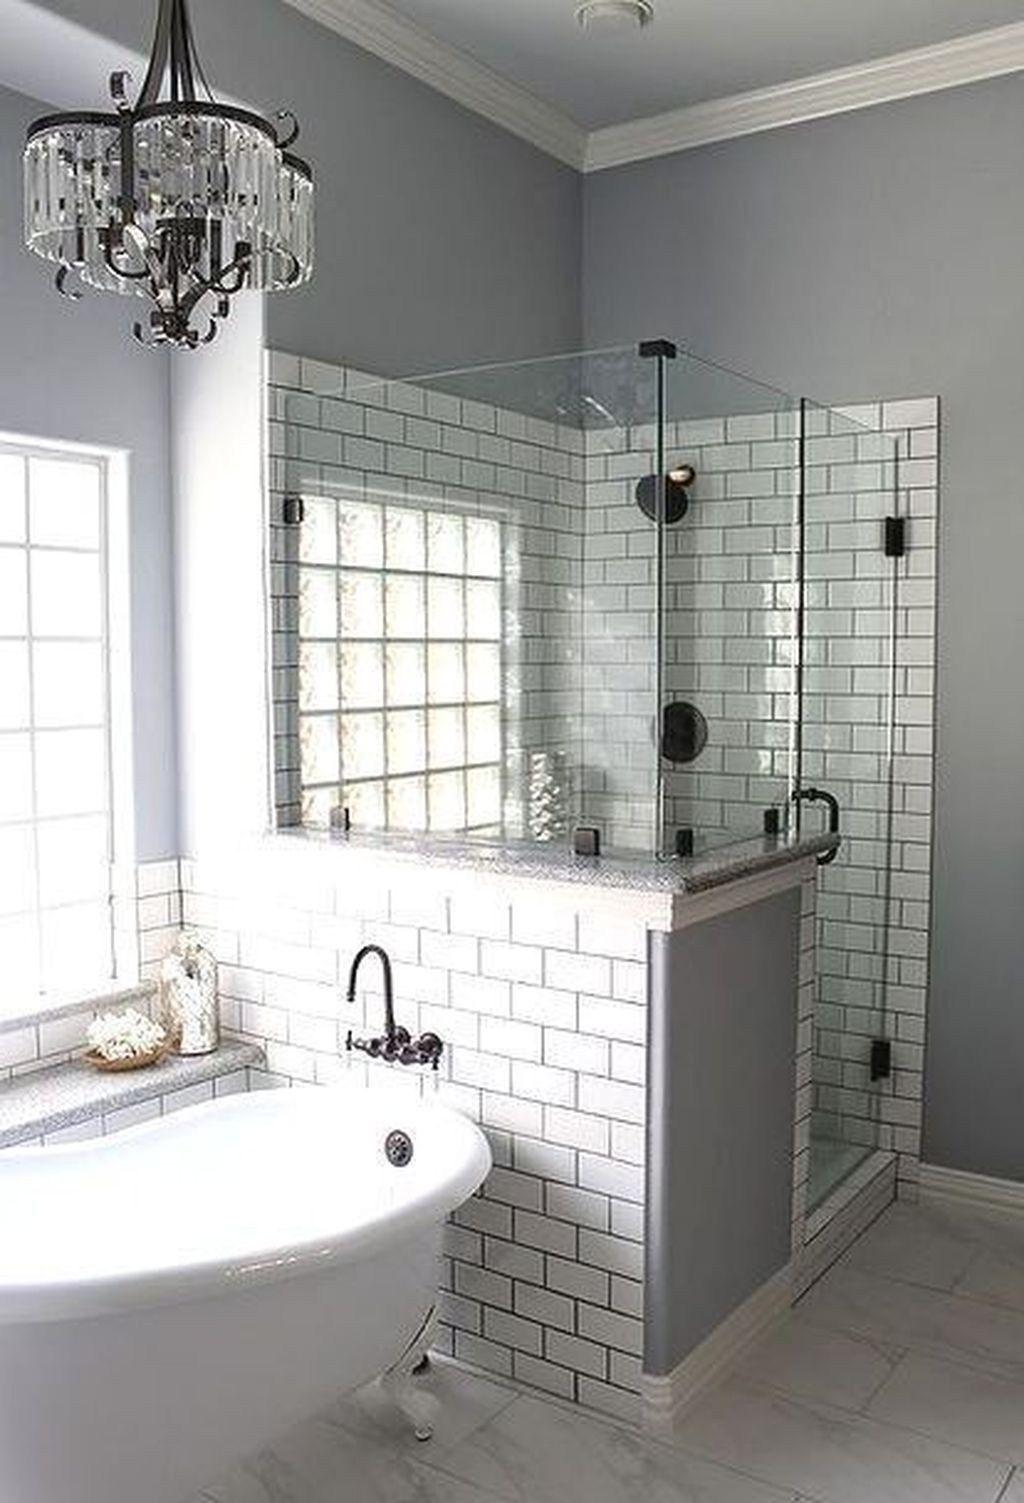 best small master bathroom remodel ideas 20 master bath on bathroom renovation ideas id=62695